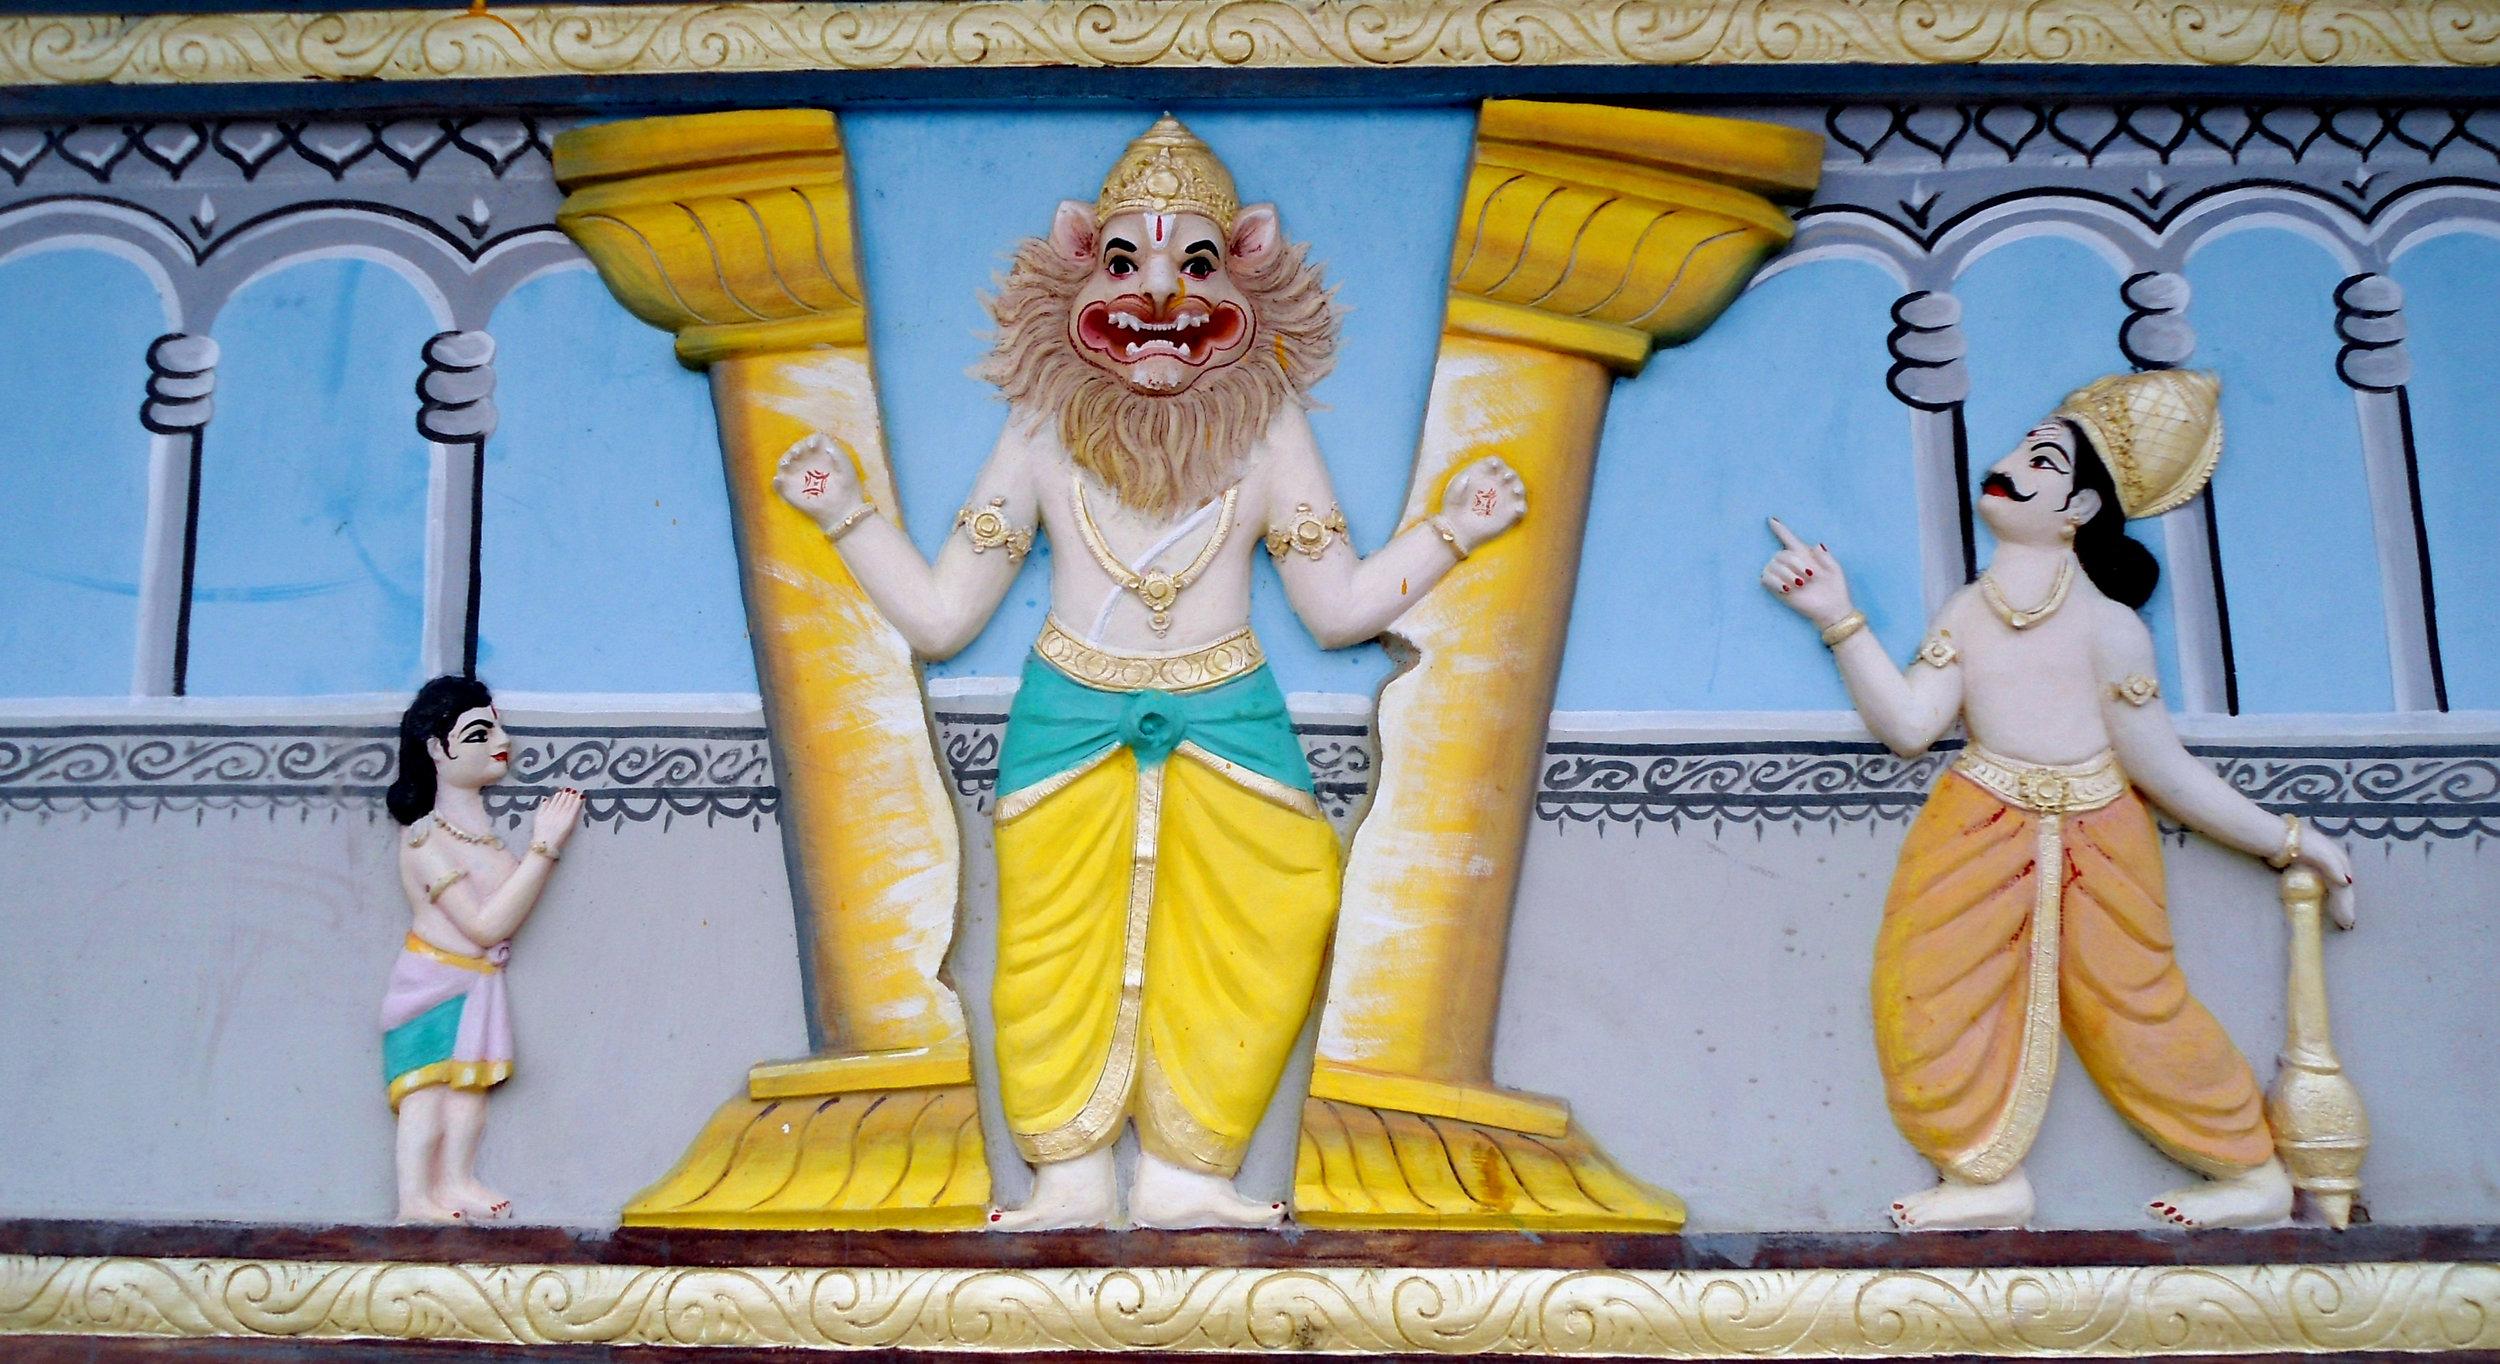 Lord_Narasimha_statue_at_Venkateswara_Temple_in_Midhilapuri_VUDA_Colony.JPG